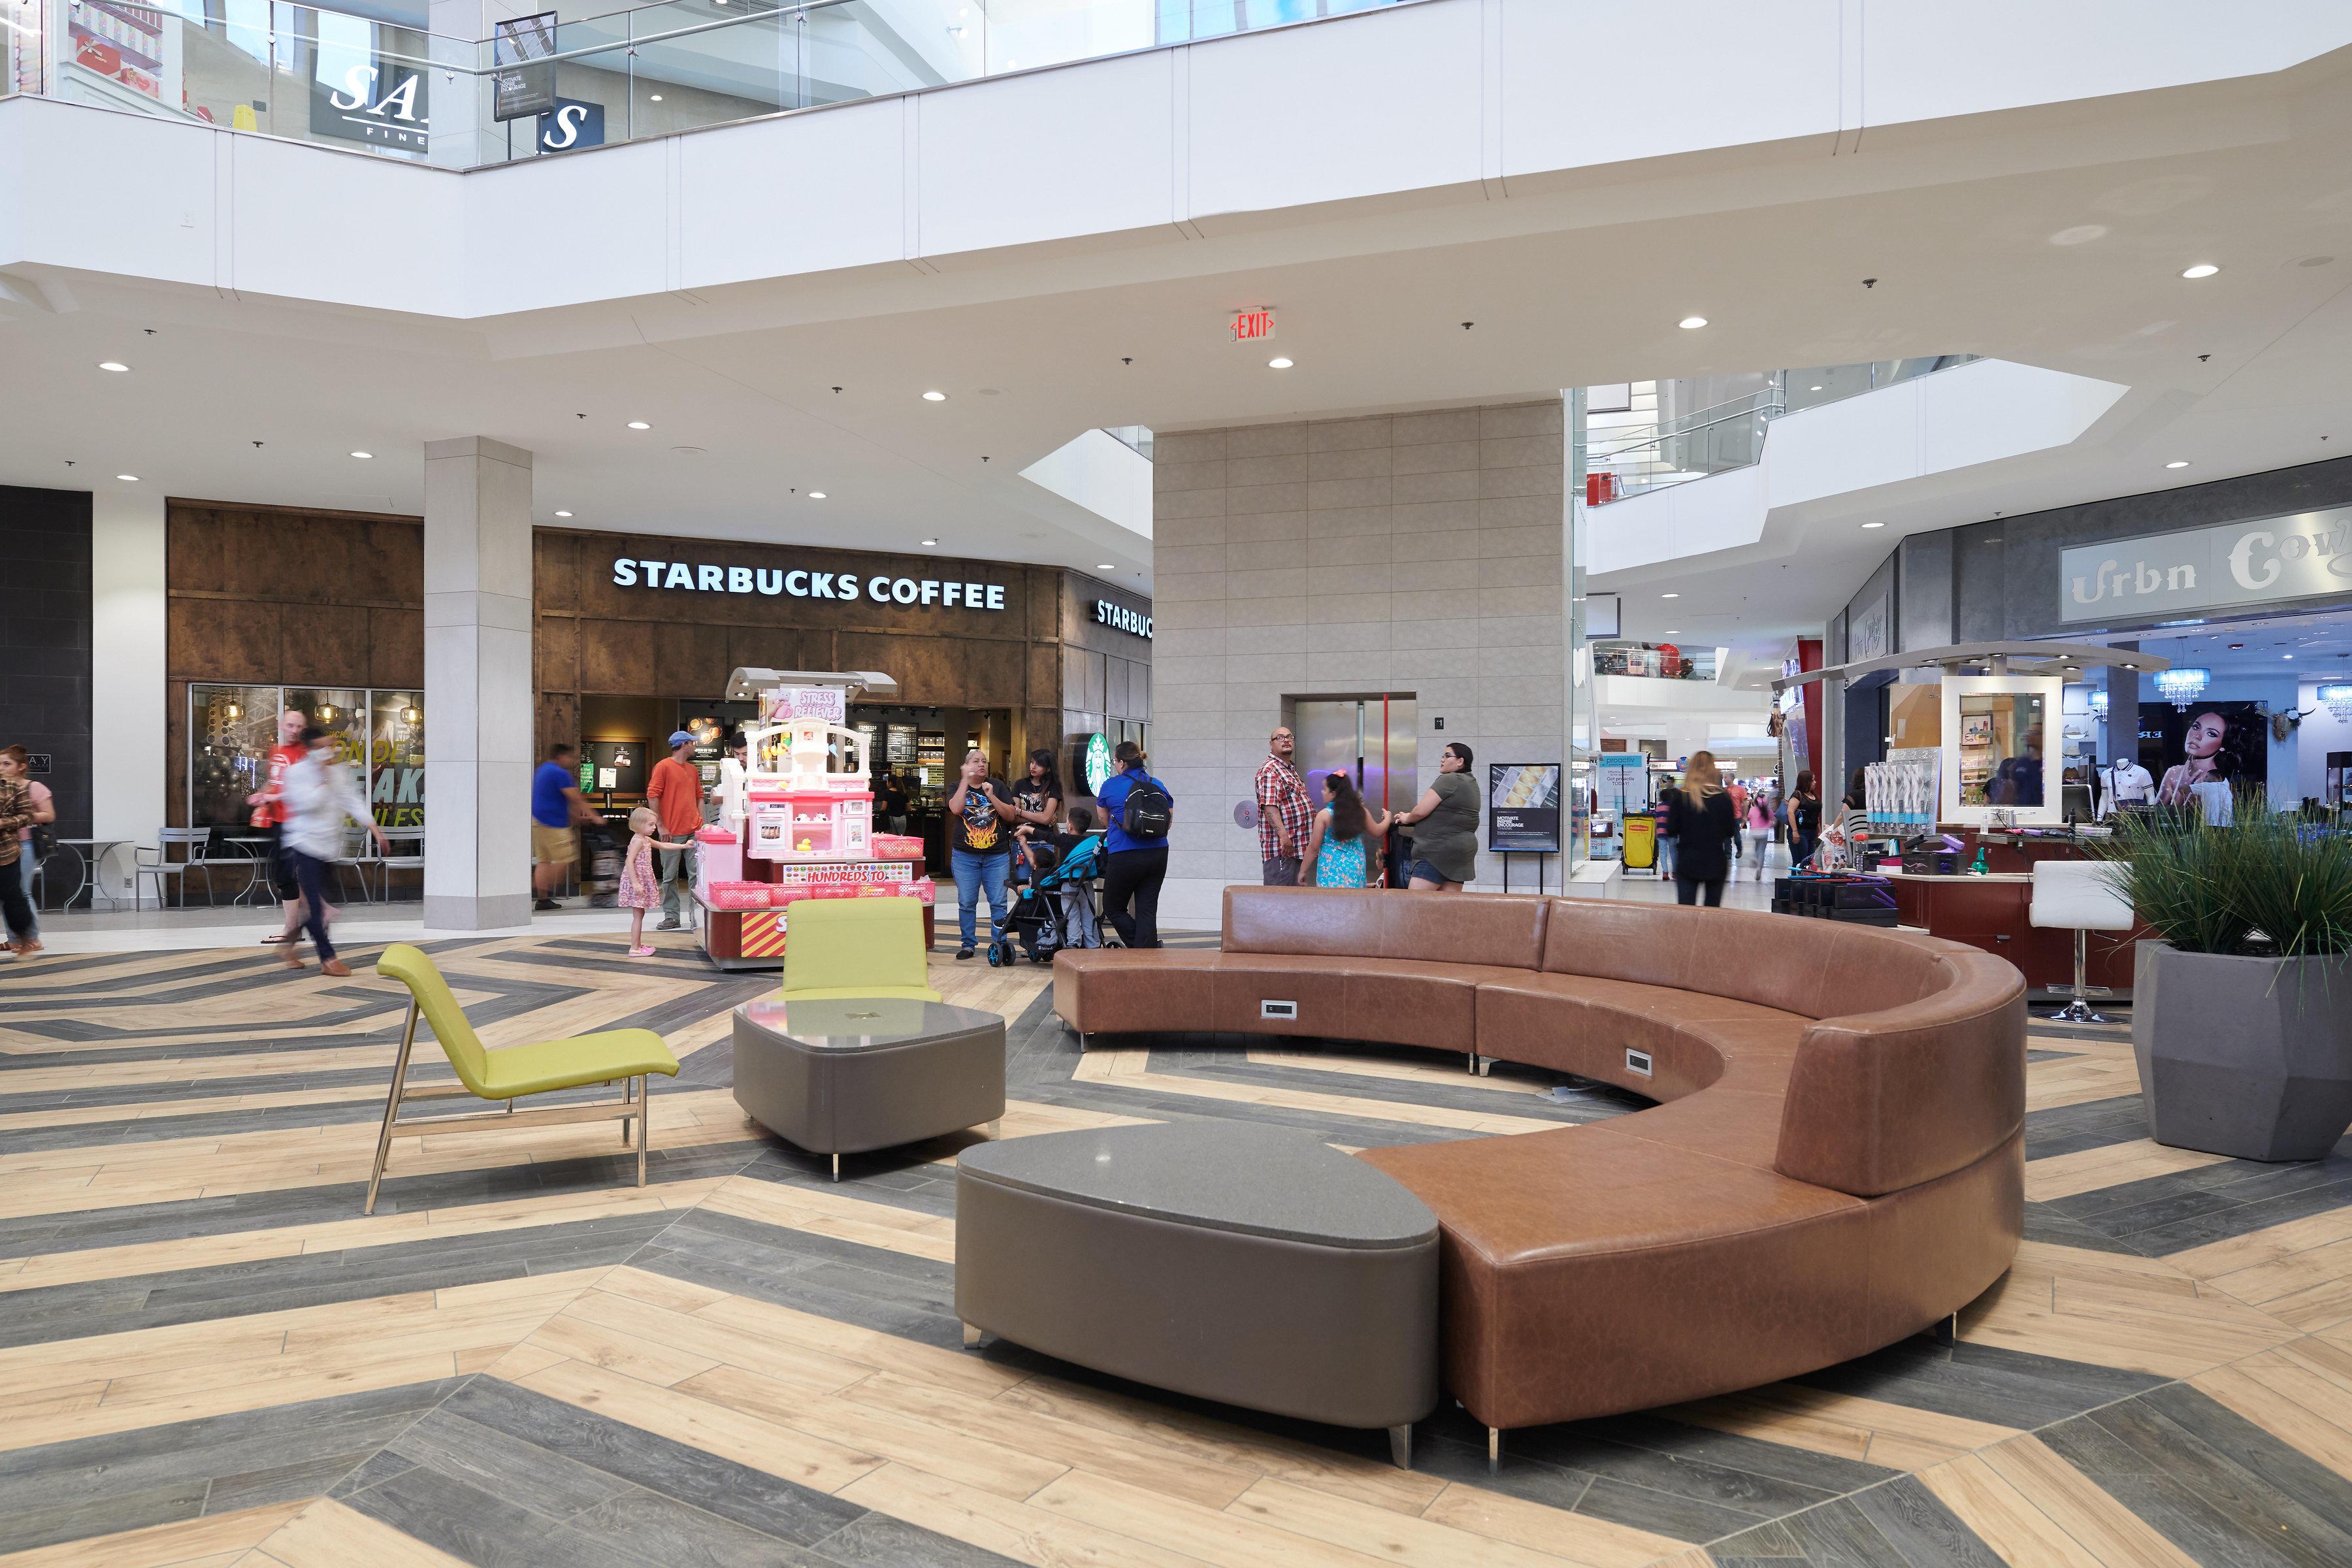 Ingram Park Mall 6301 NW Loop 410 San